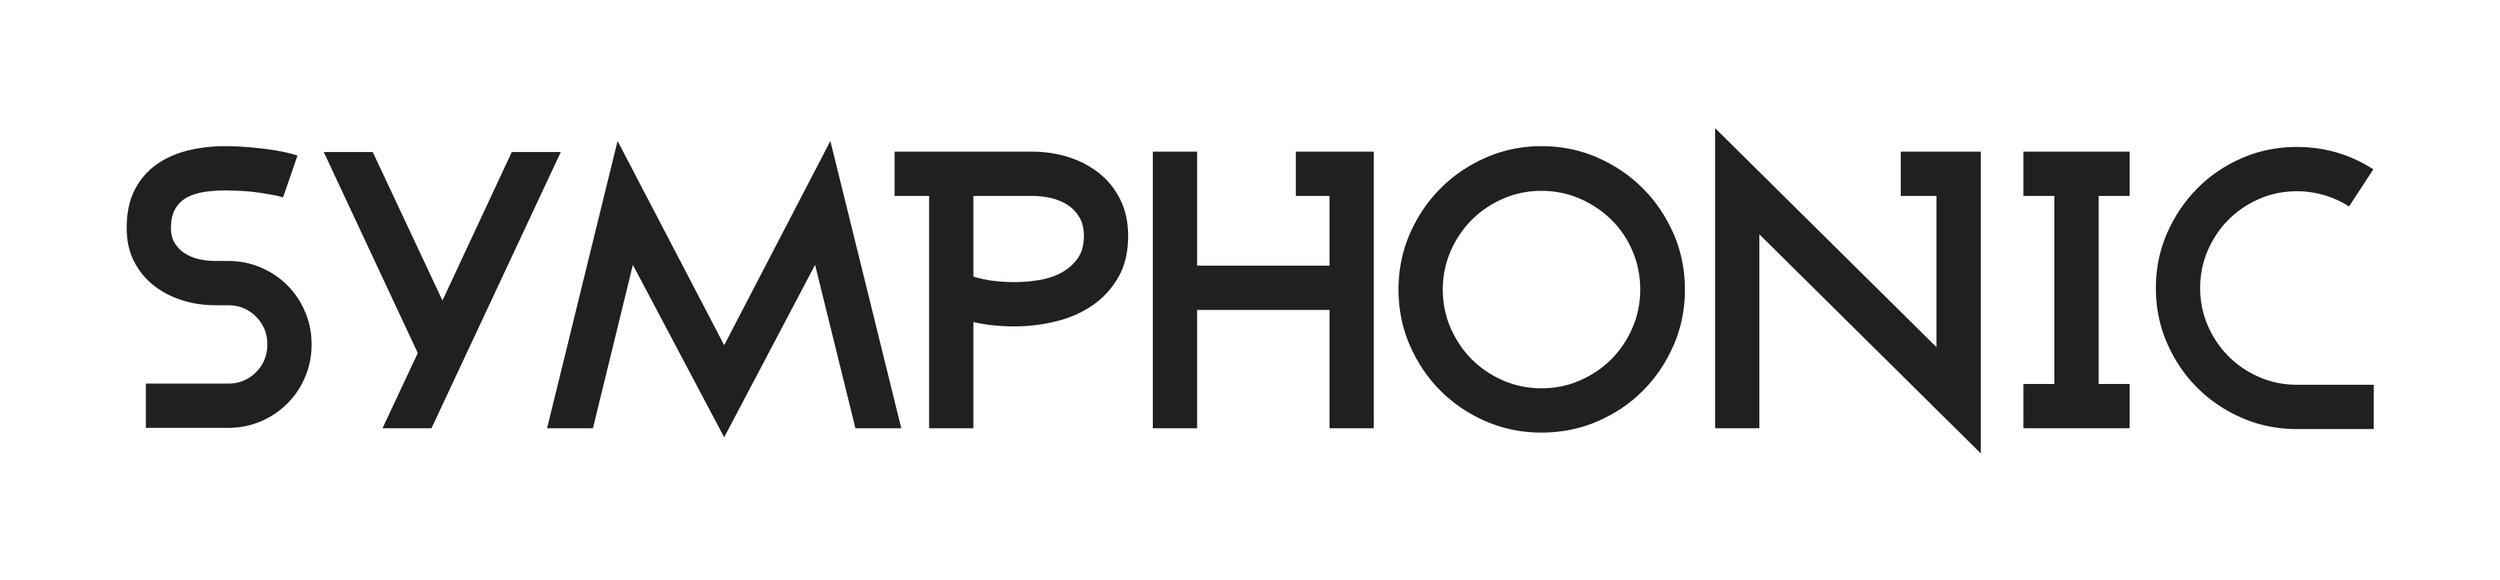 Symphonic_Logo_Vector_Black.jpg